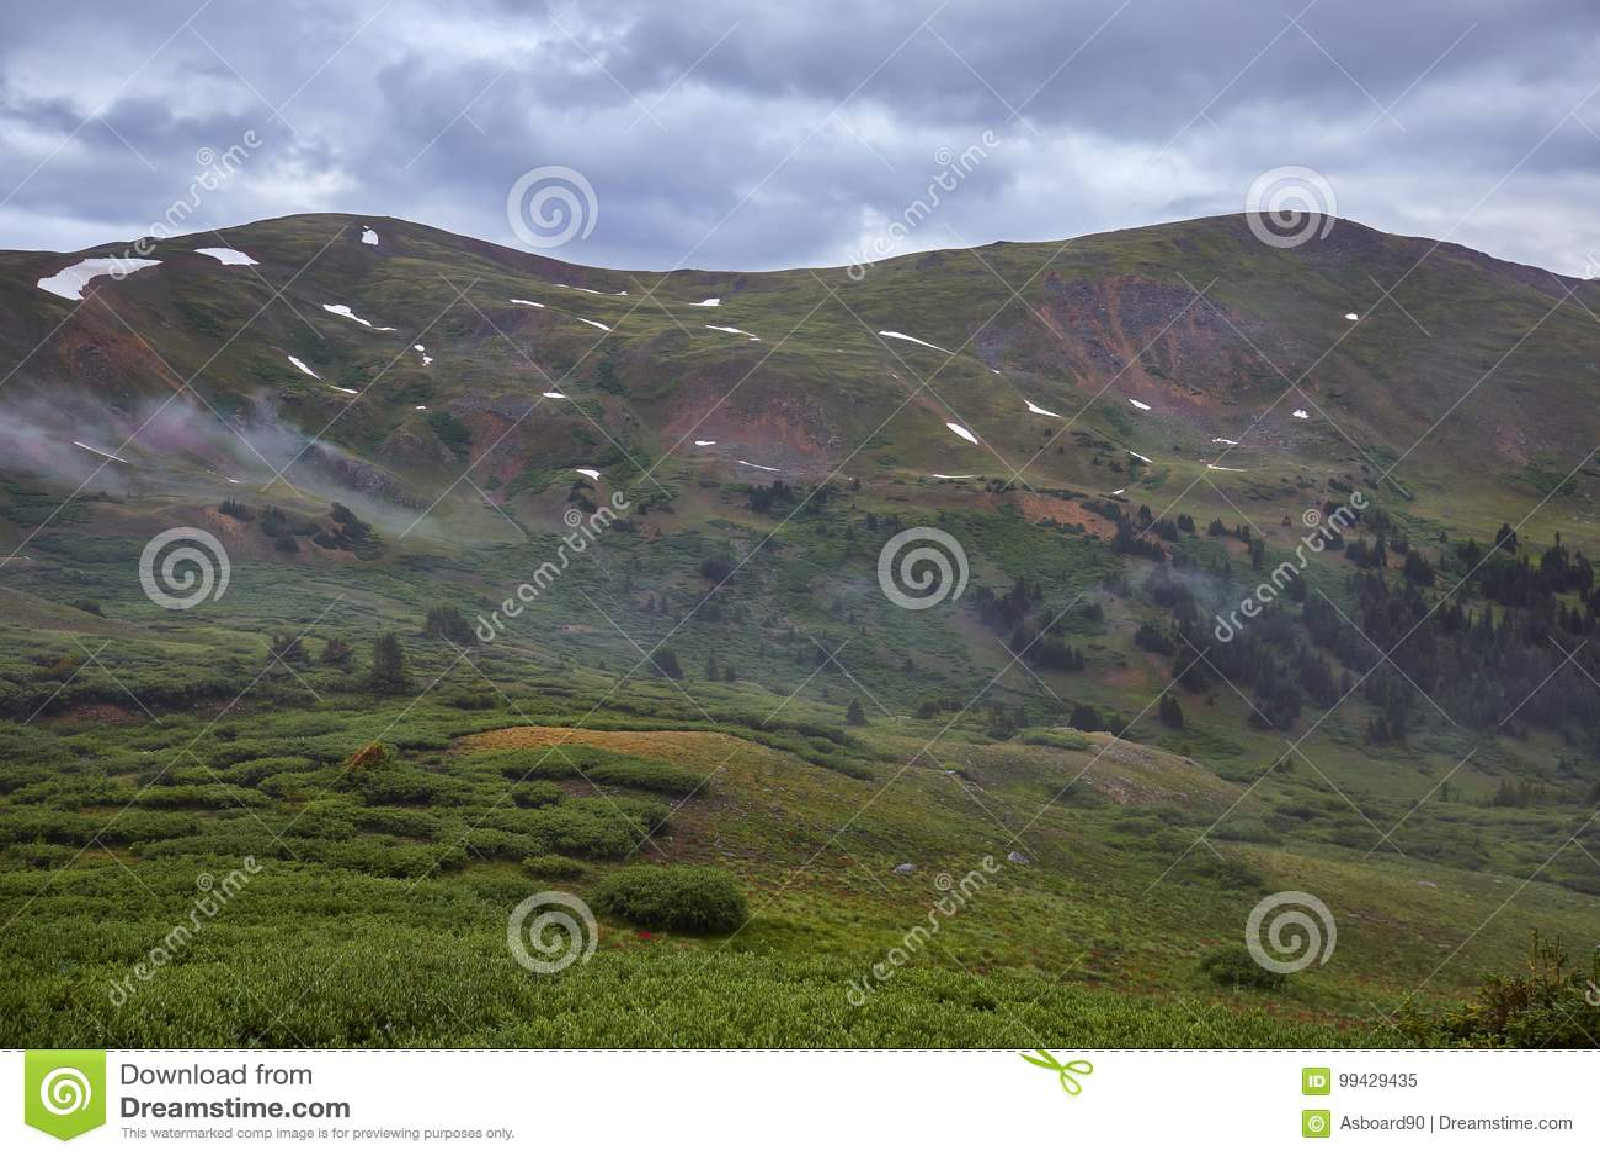 Lovelandpas, Colorado